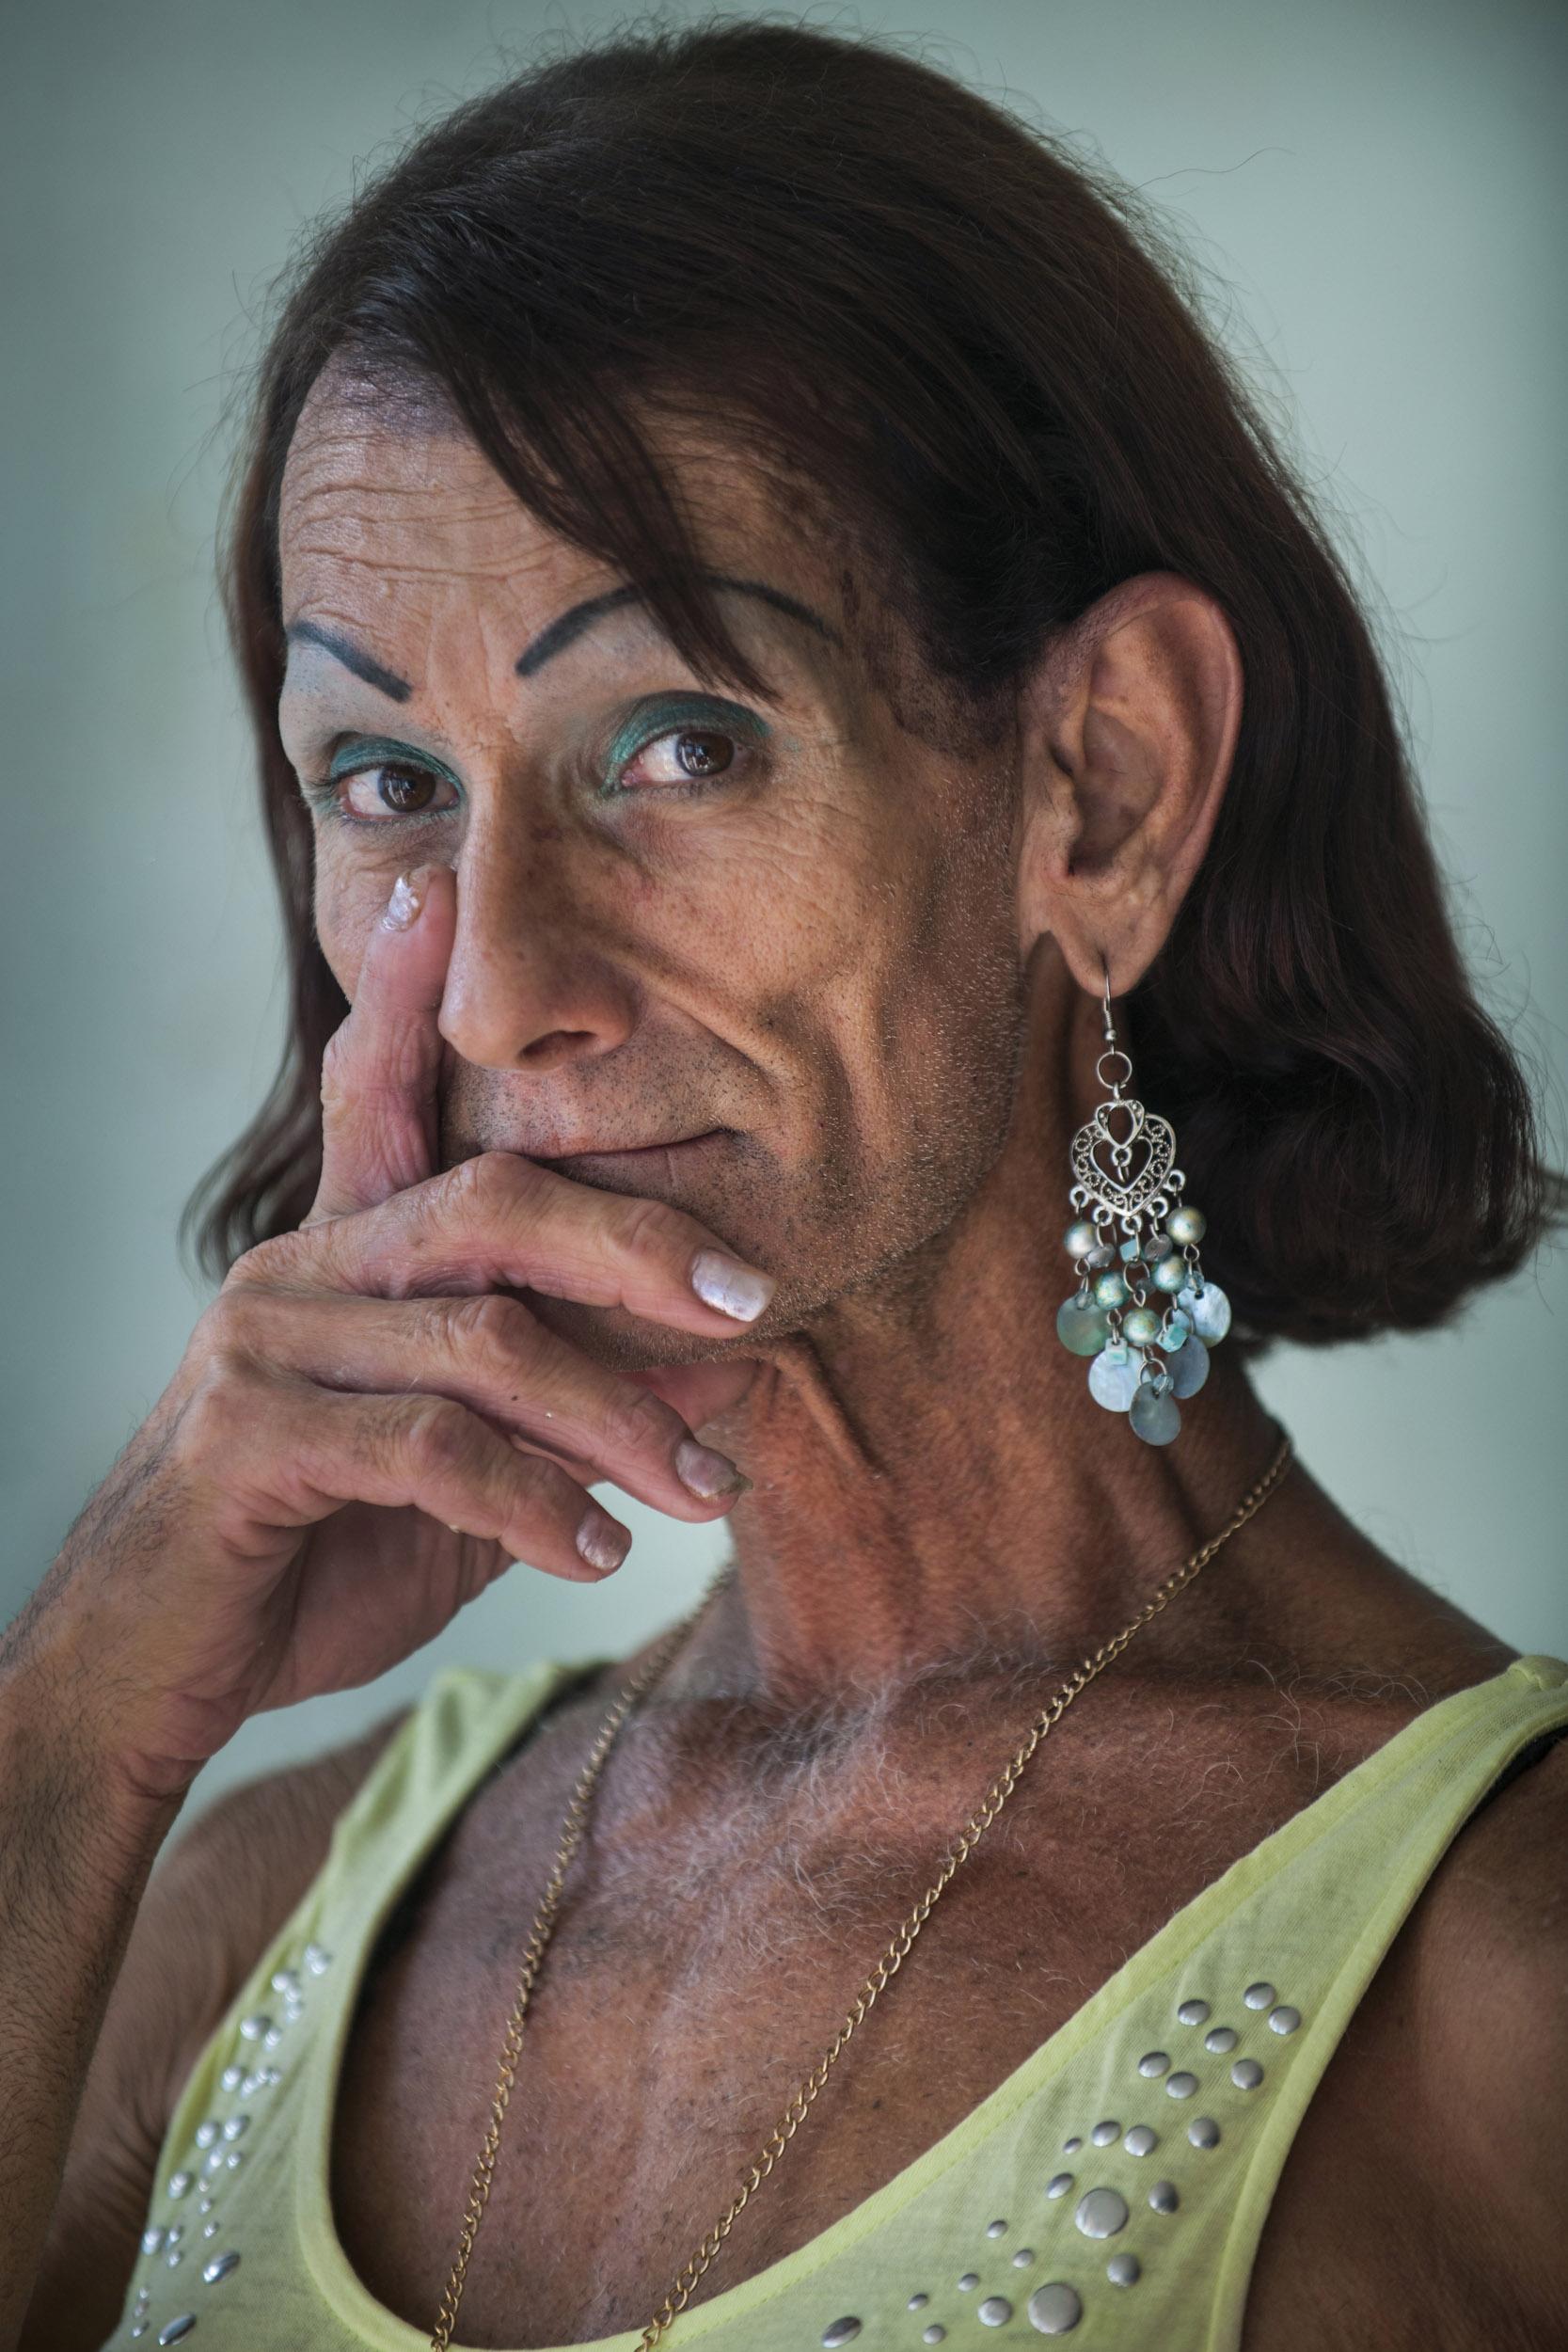 Malú, artist - Illuminated Cuba - Hector Garrido, Aerial and human photography